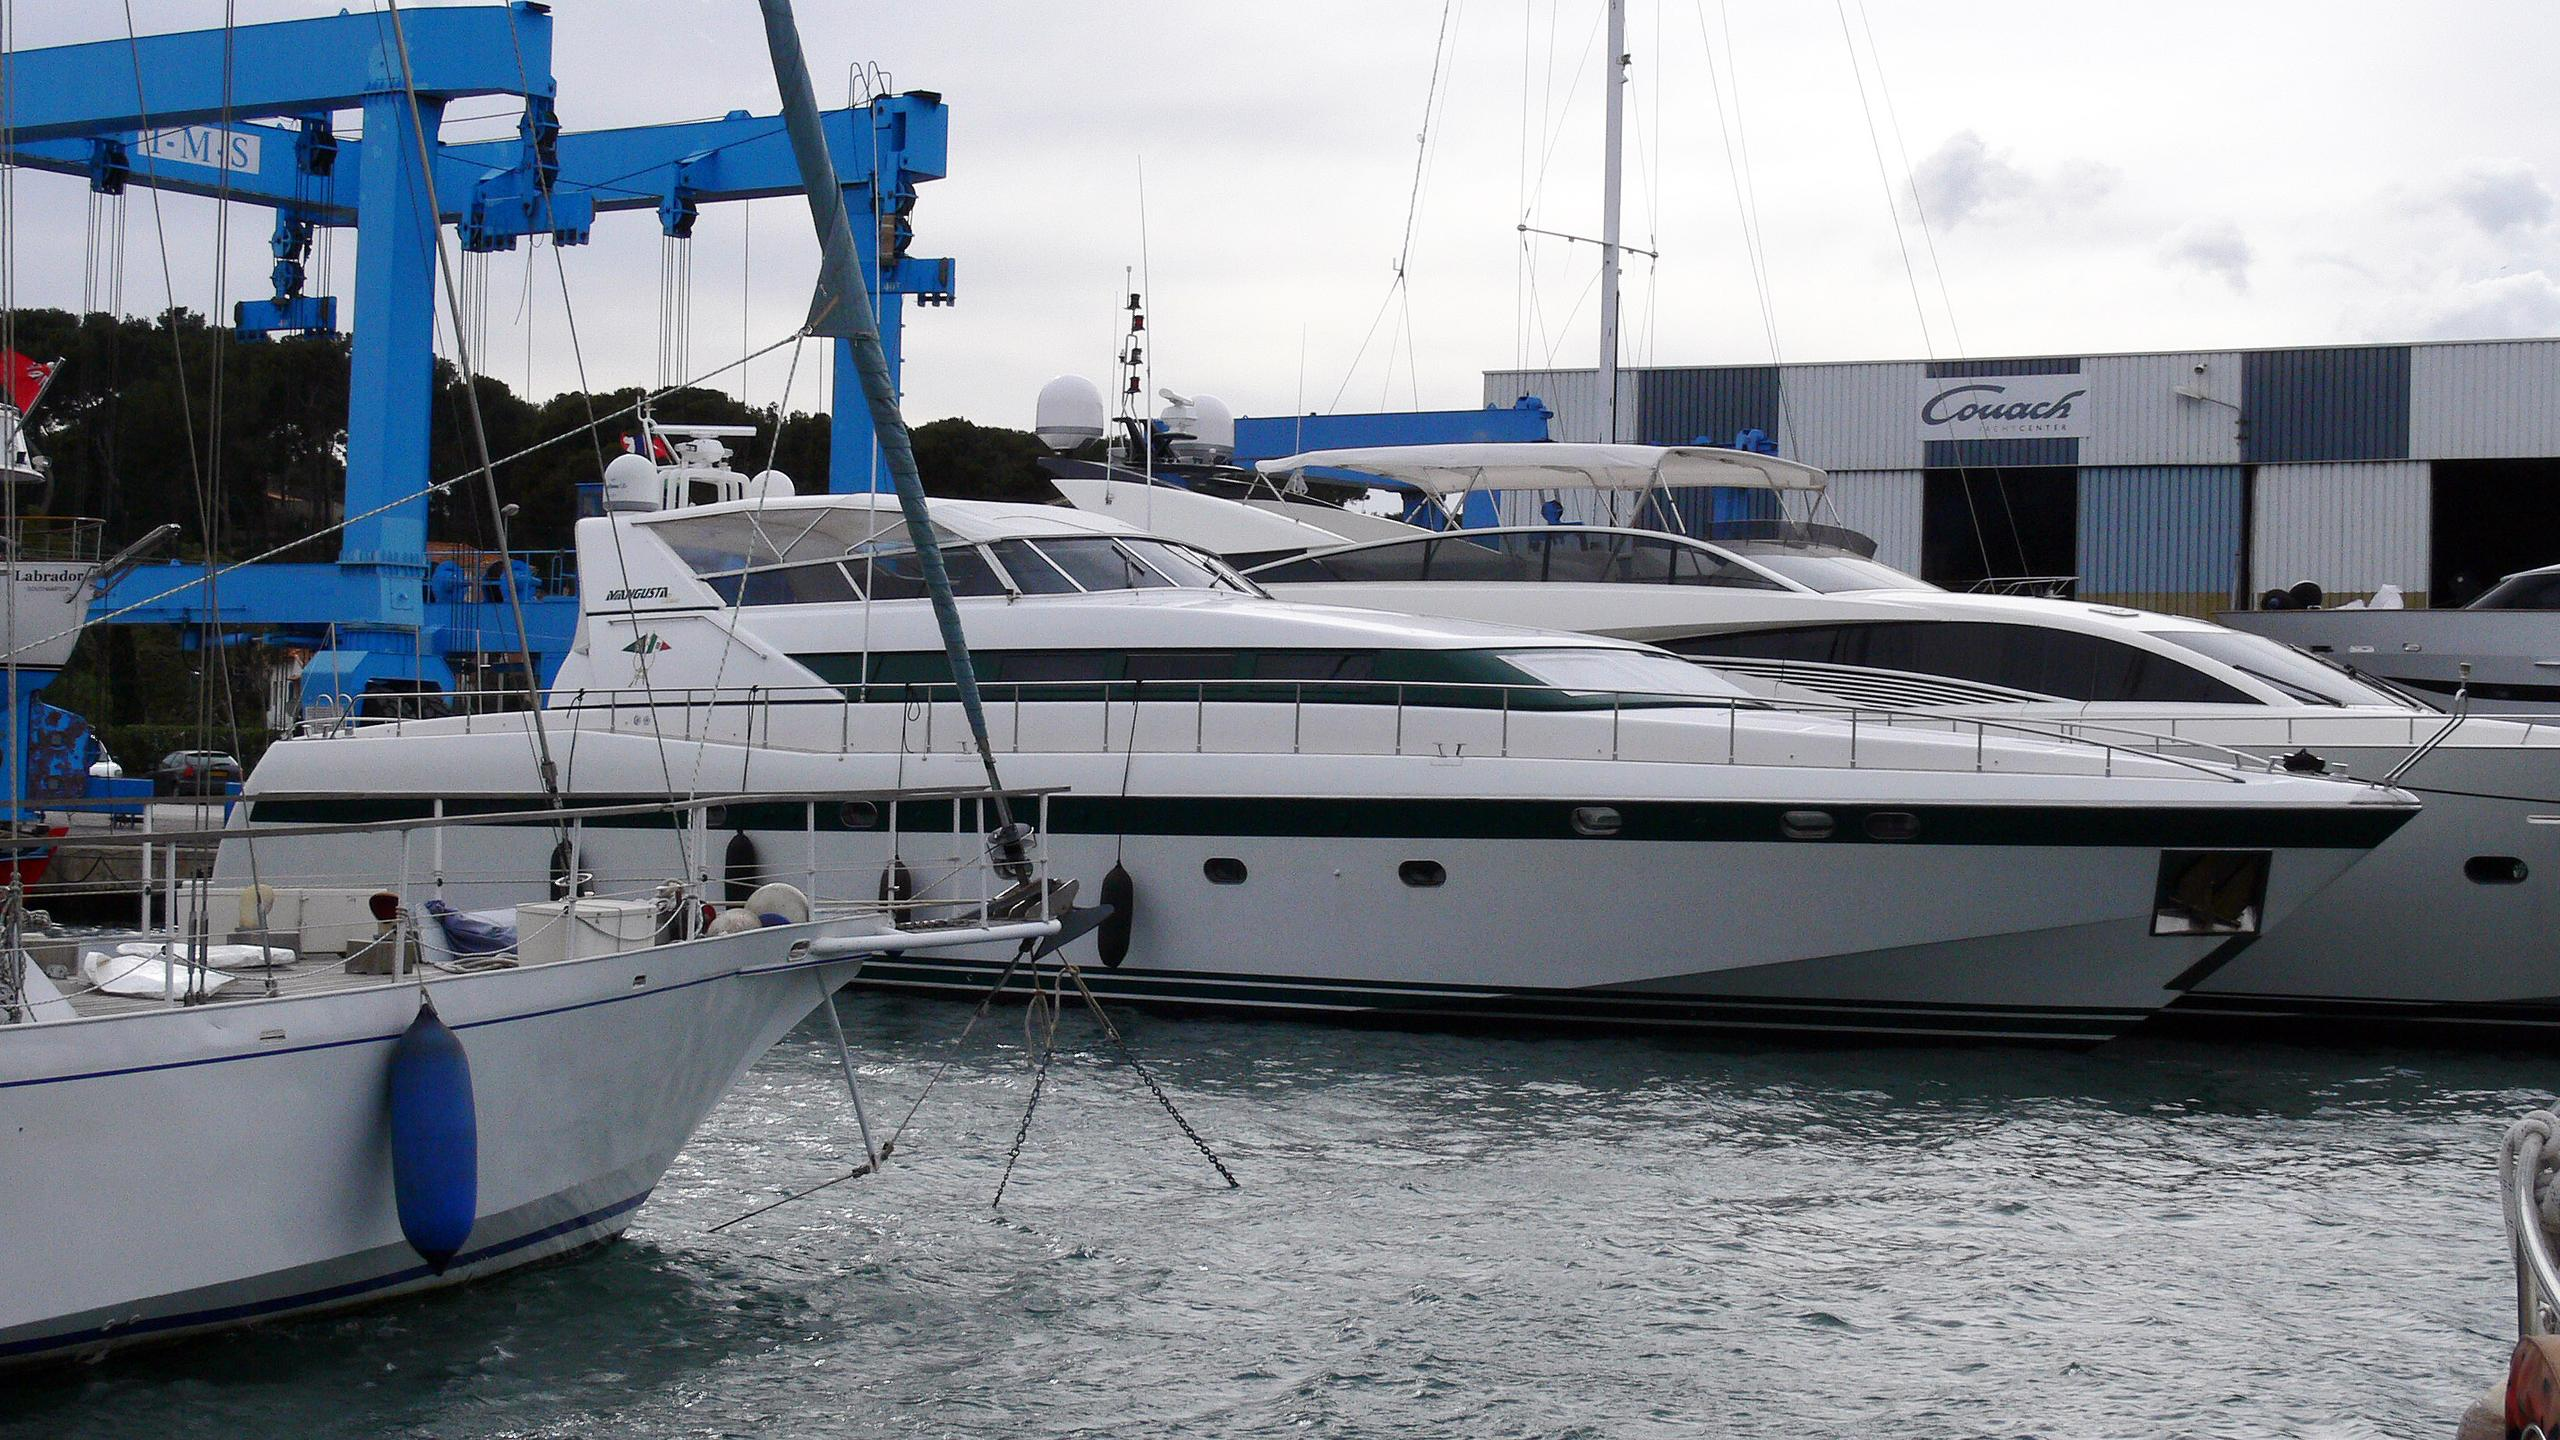 yeratel-motor-yacht-overmarine-mangusta-92-open-1995-28m-profile